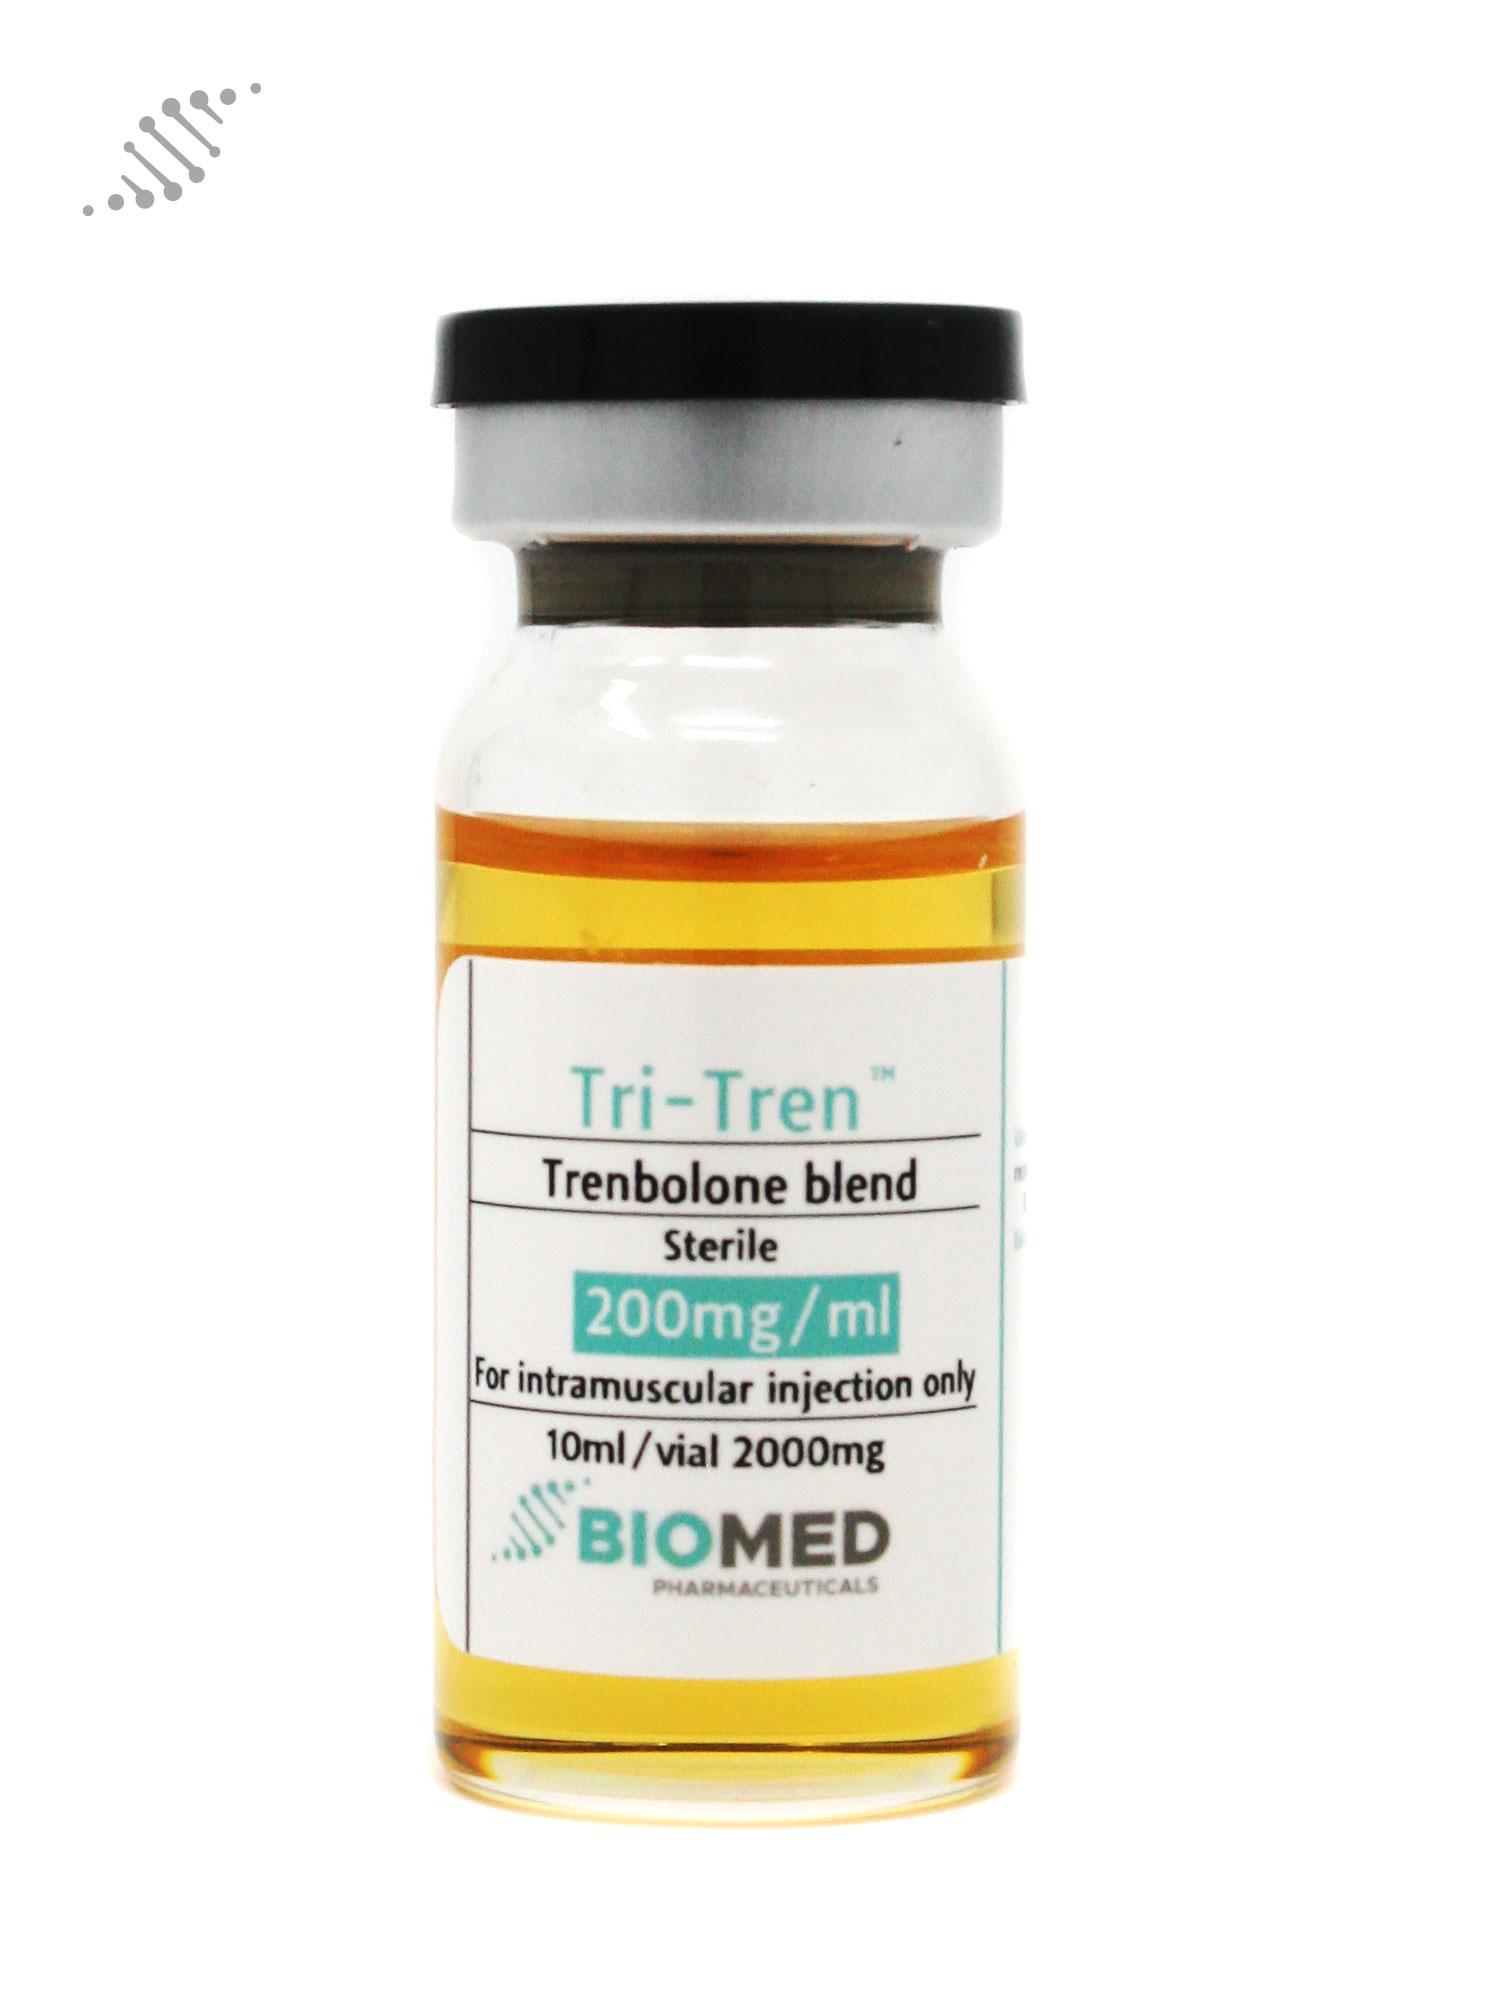 Tri-Tren Trenbolone Blend 200ml